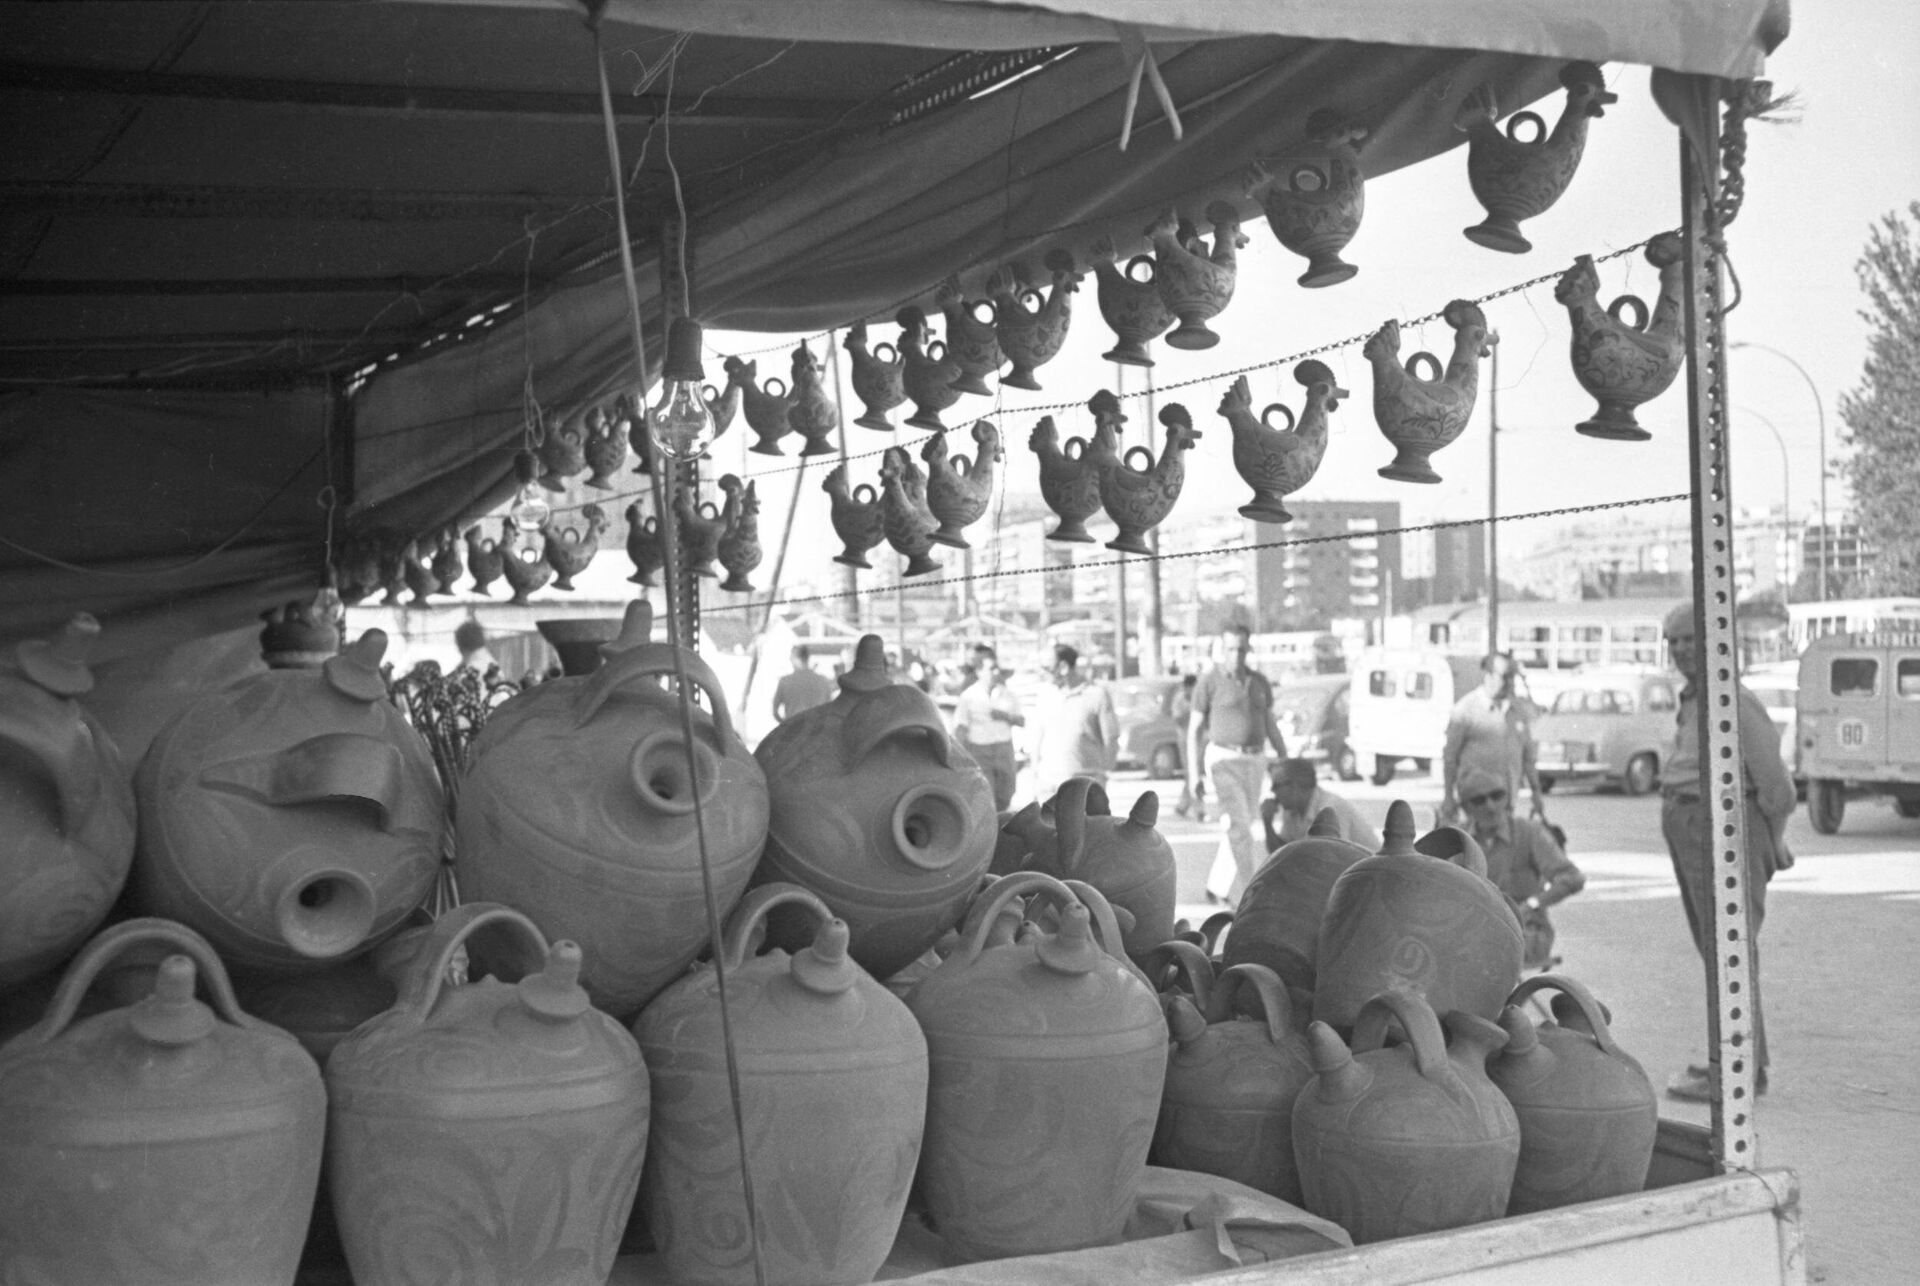 Puesto callejero de botijos. Madrid, 1972 - Sputnik Mundo, 1920, 17.09.2021